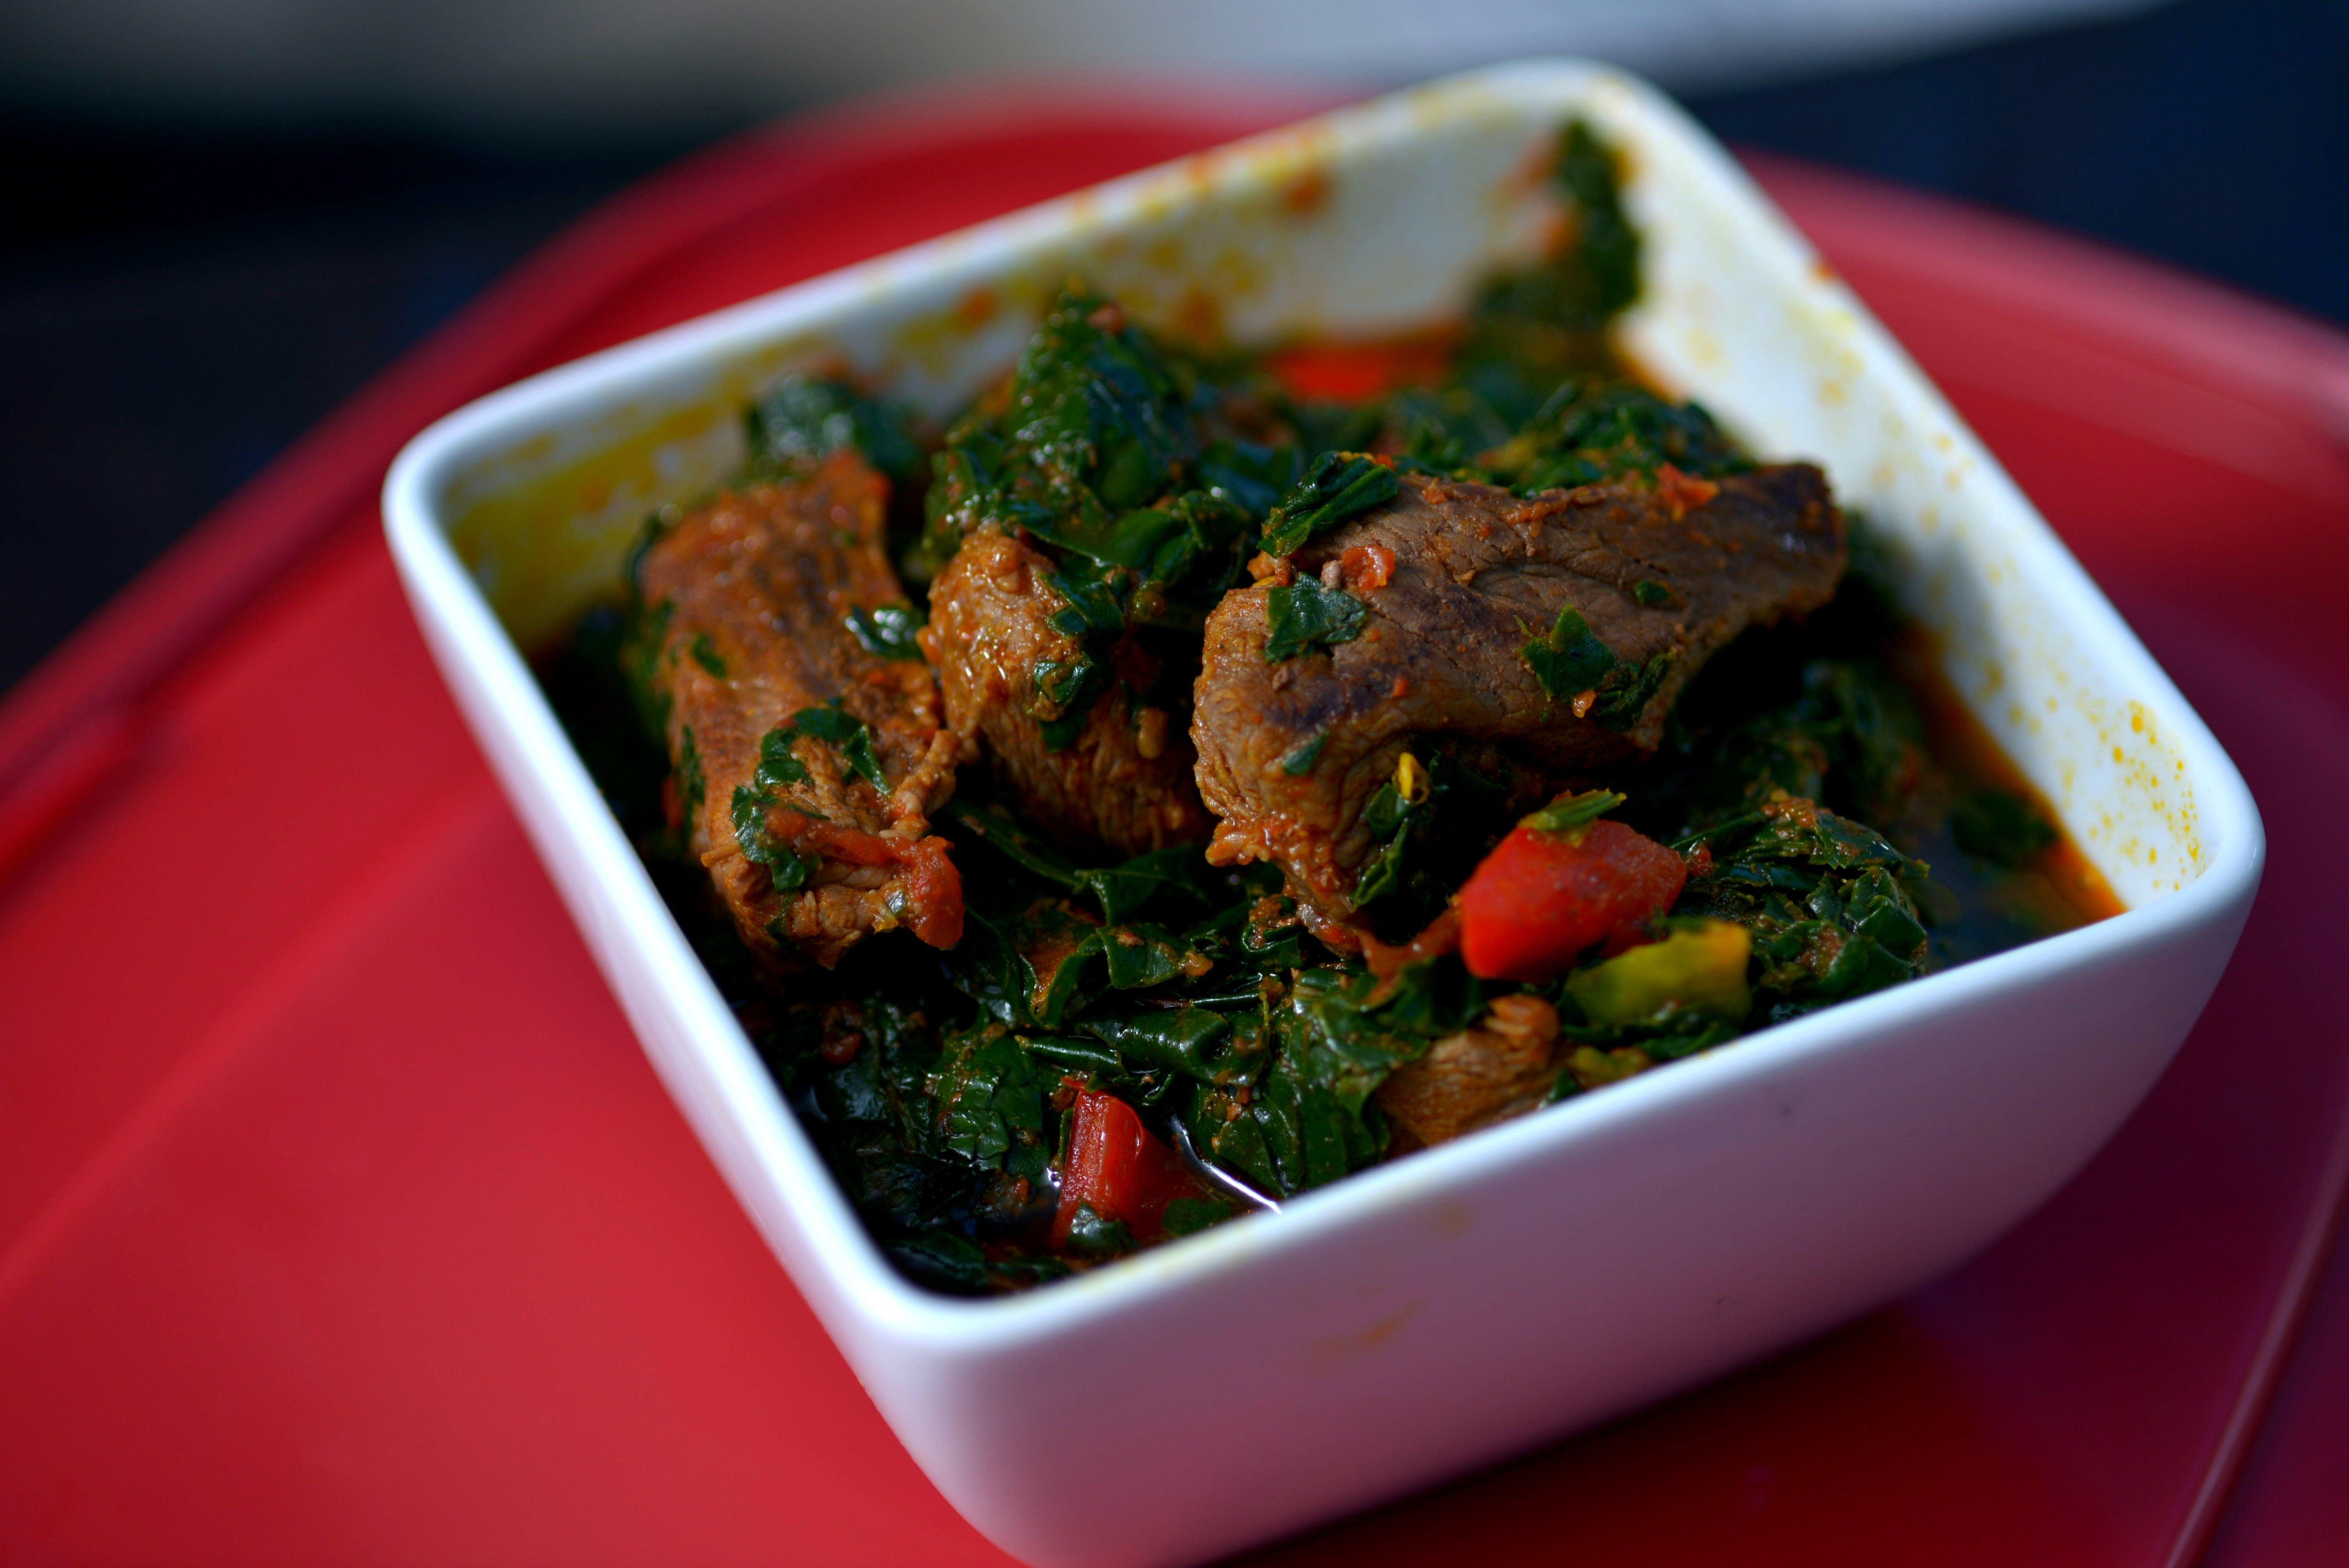 Efo riro cuisine africaine pinterest for Cuisine africaine